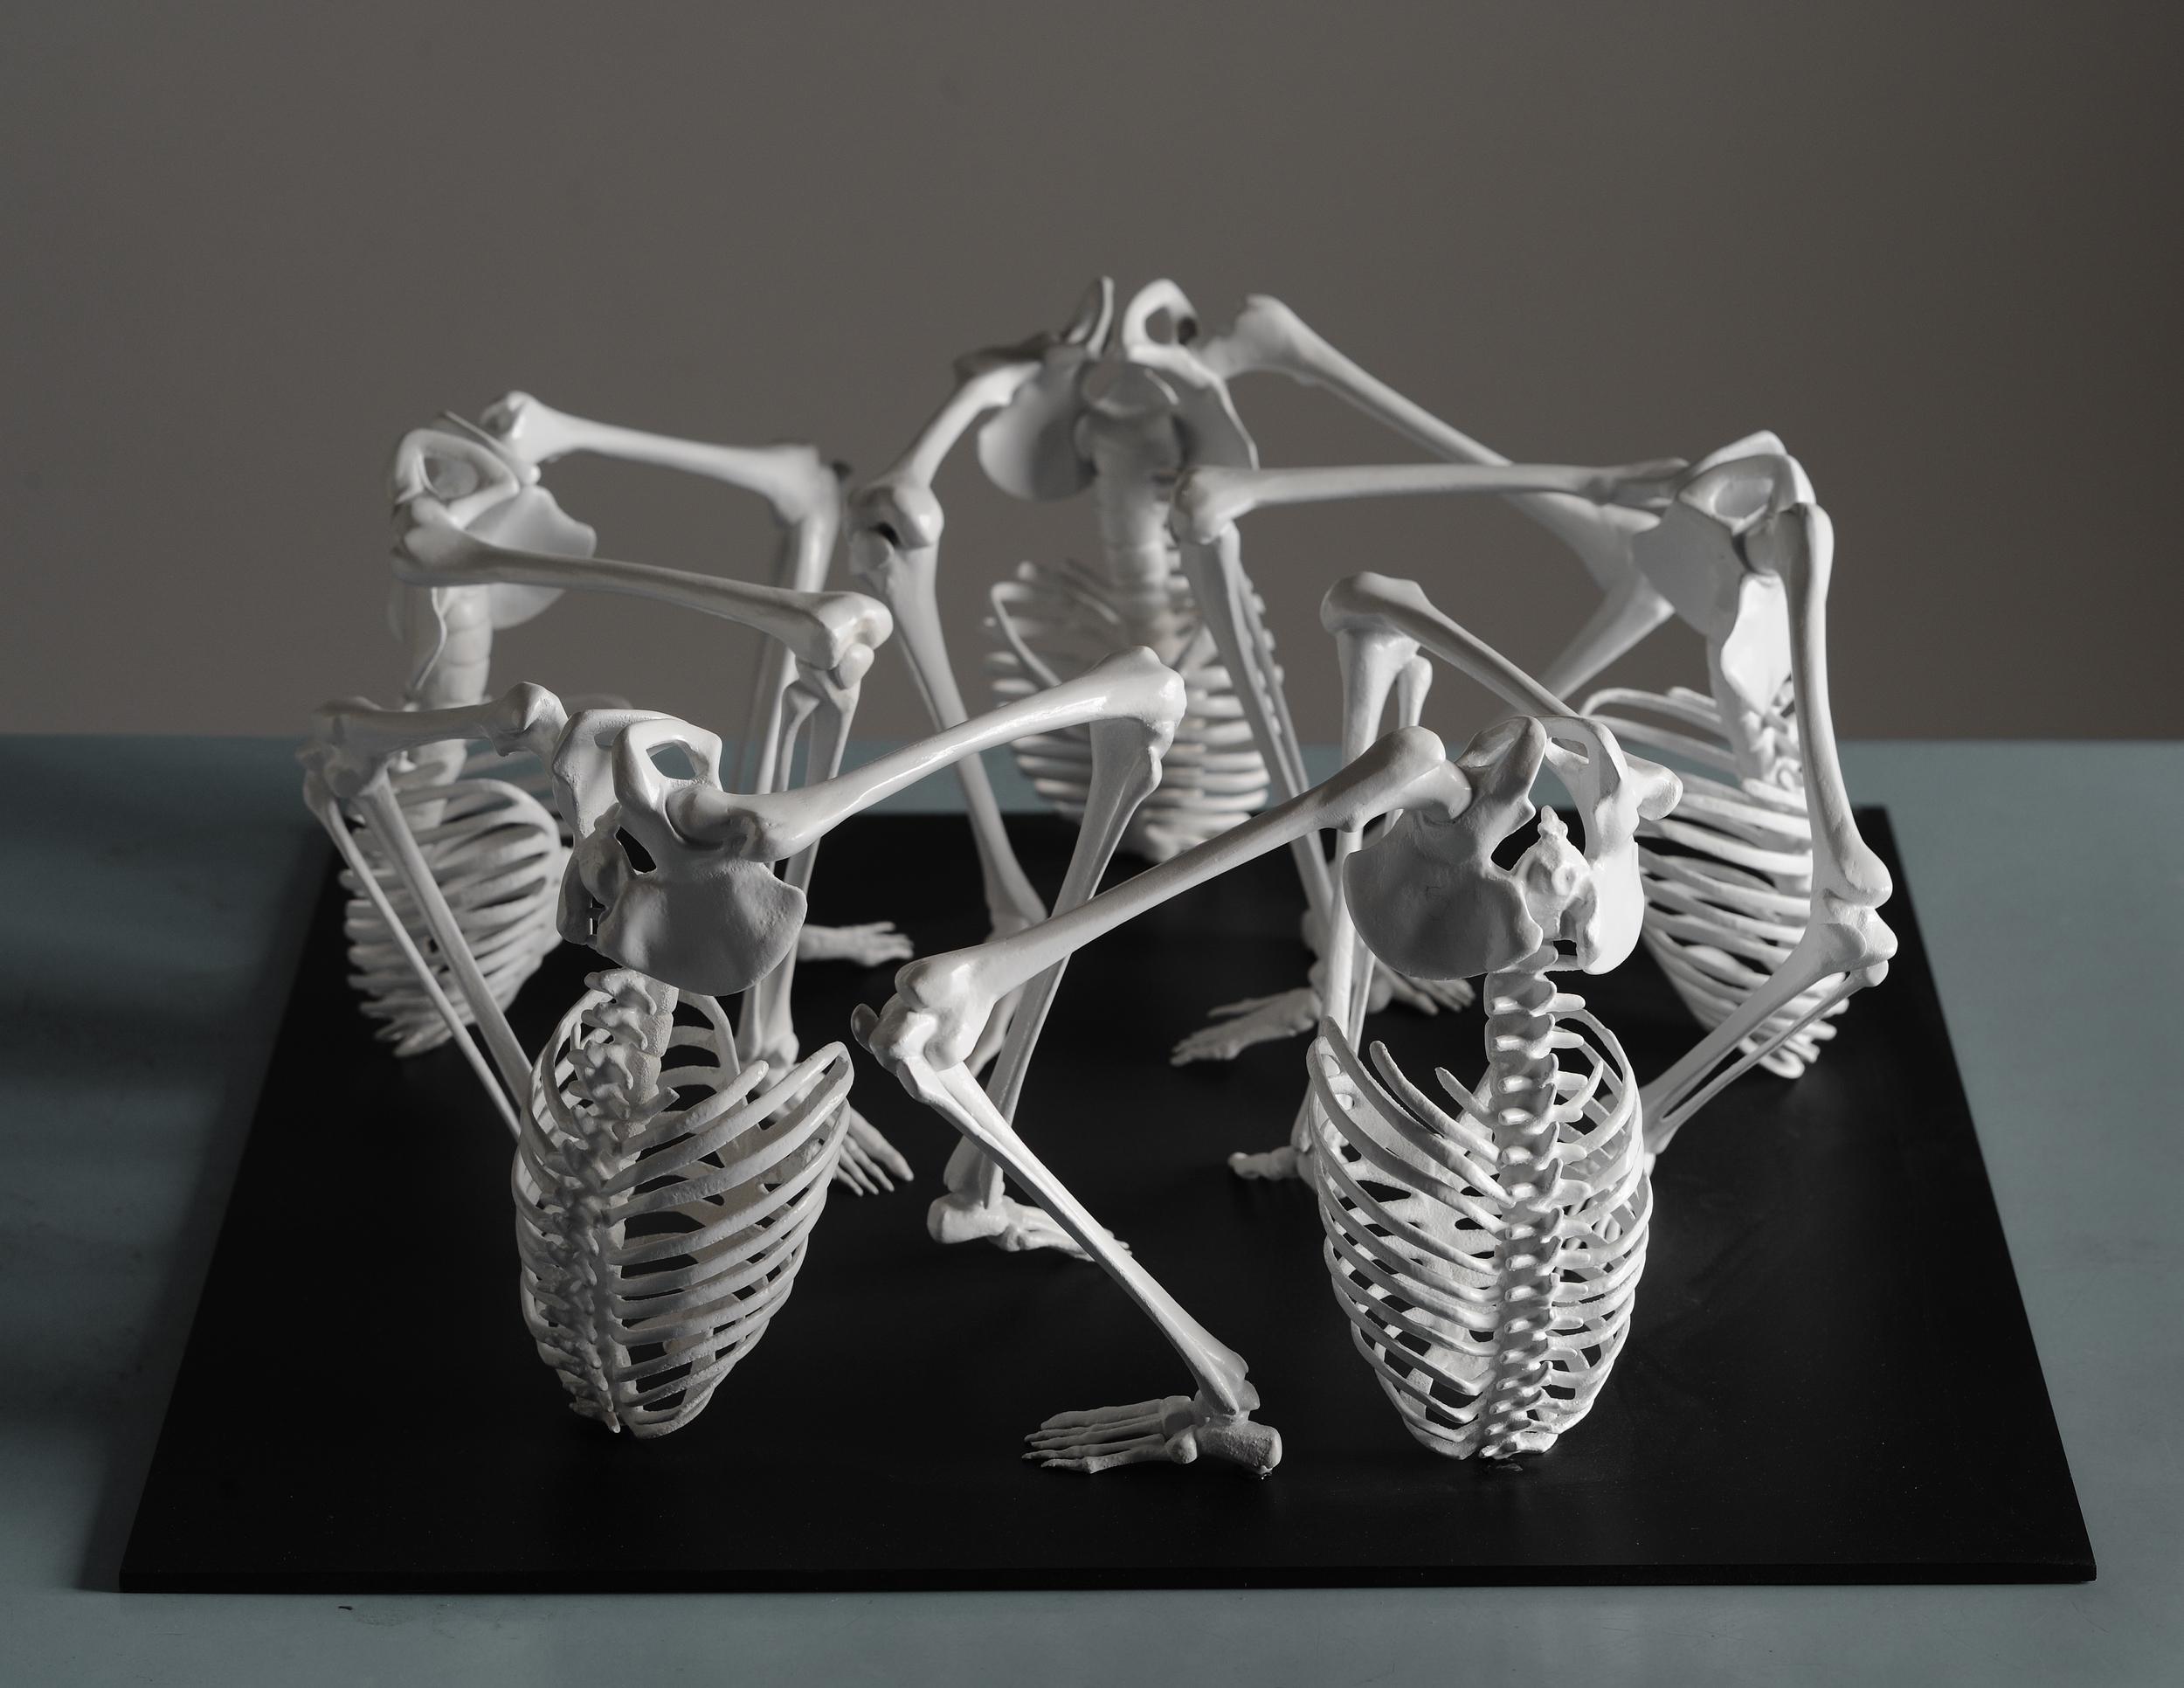 K3(Communication Cycle), gypsum composite(3D project Digital Sculptures),2011 @Monika Horčicová/ @Photo Ondřej Polák